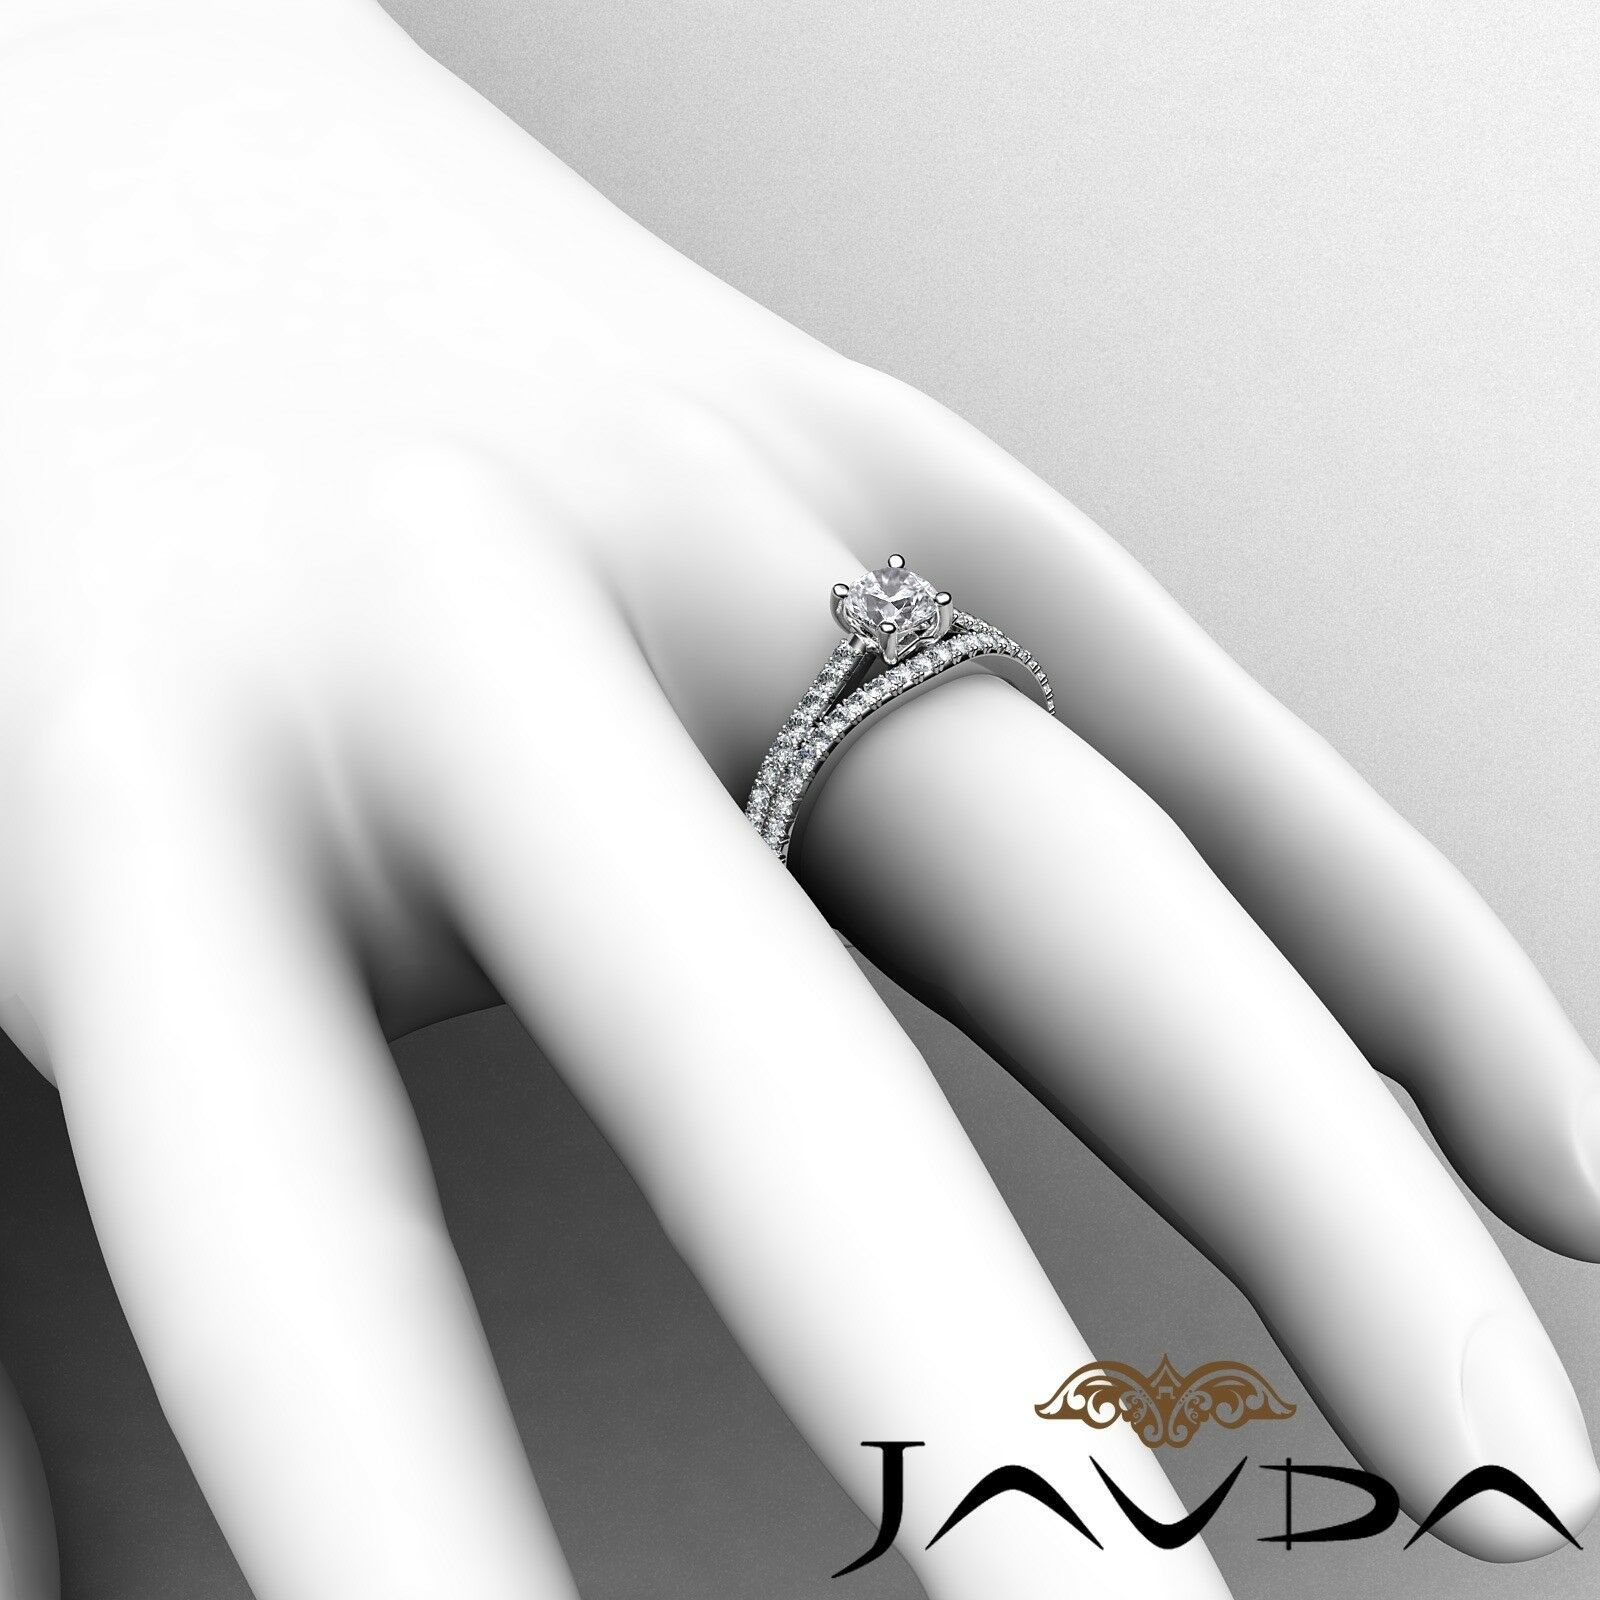 1.51ctw Double Prong Bridal Set Cushion Diamond Engagement Ring GIA F-VS1 W Gold 6